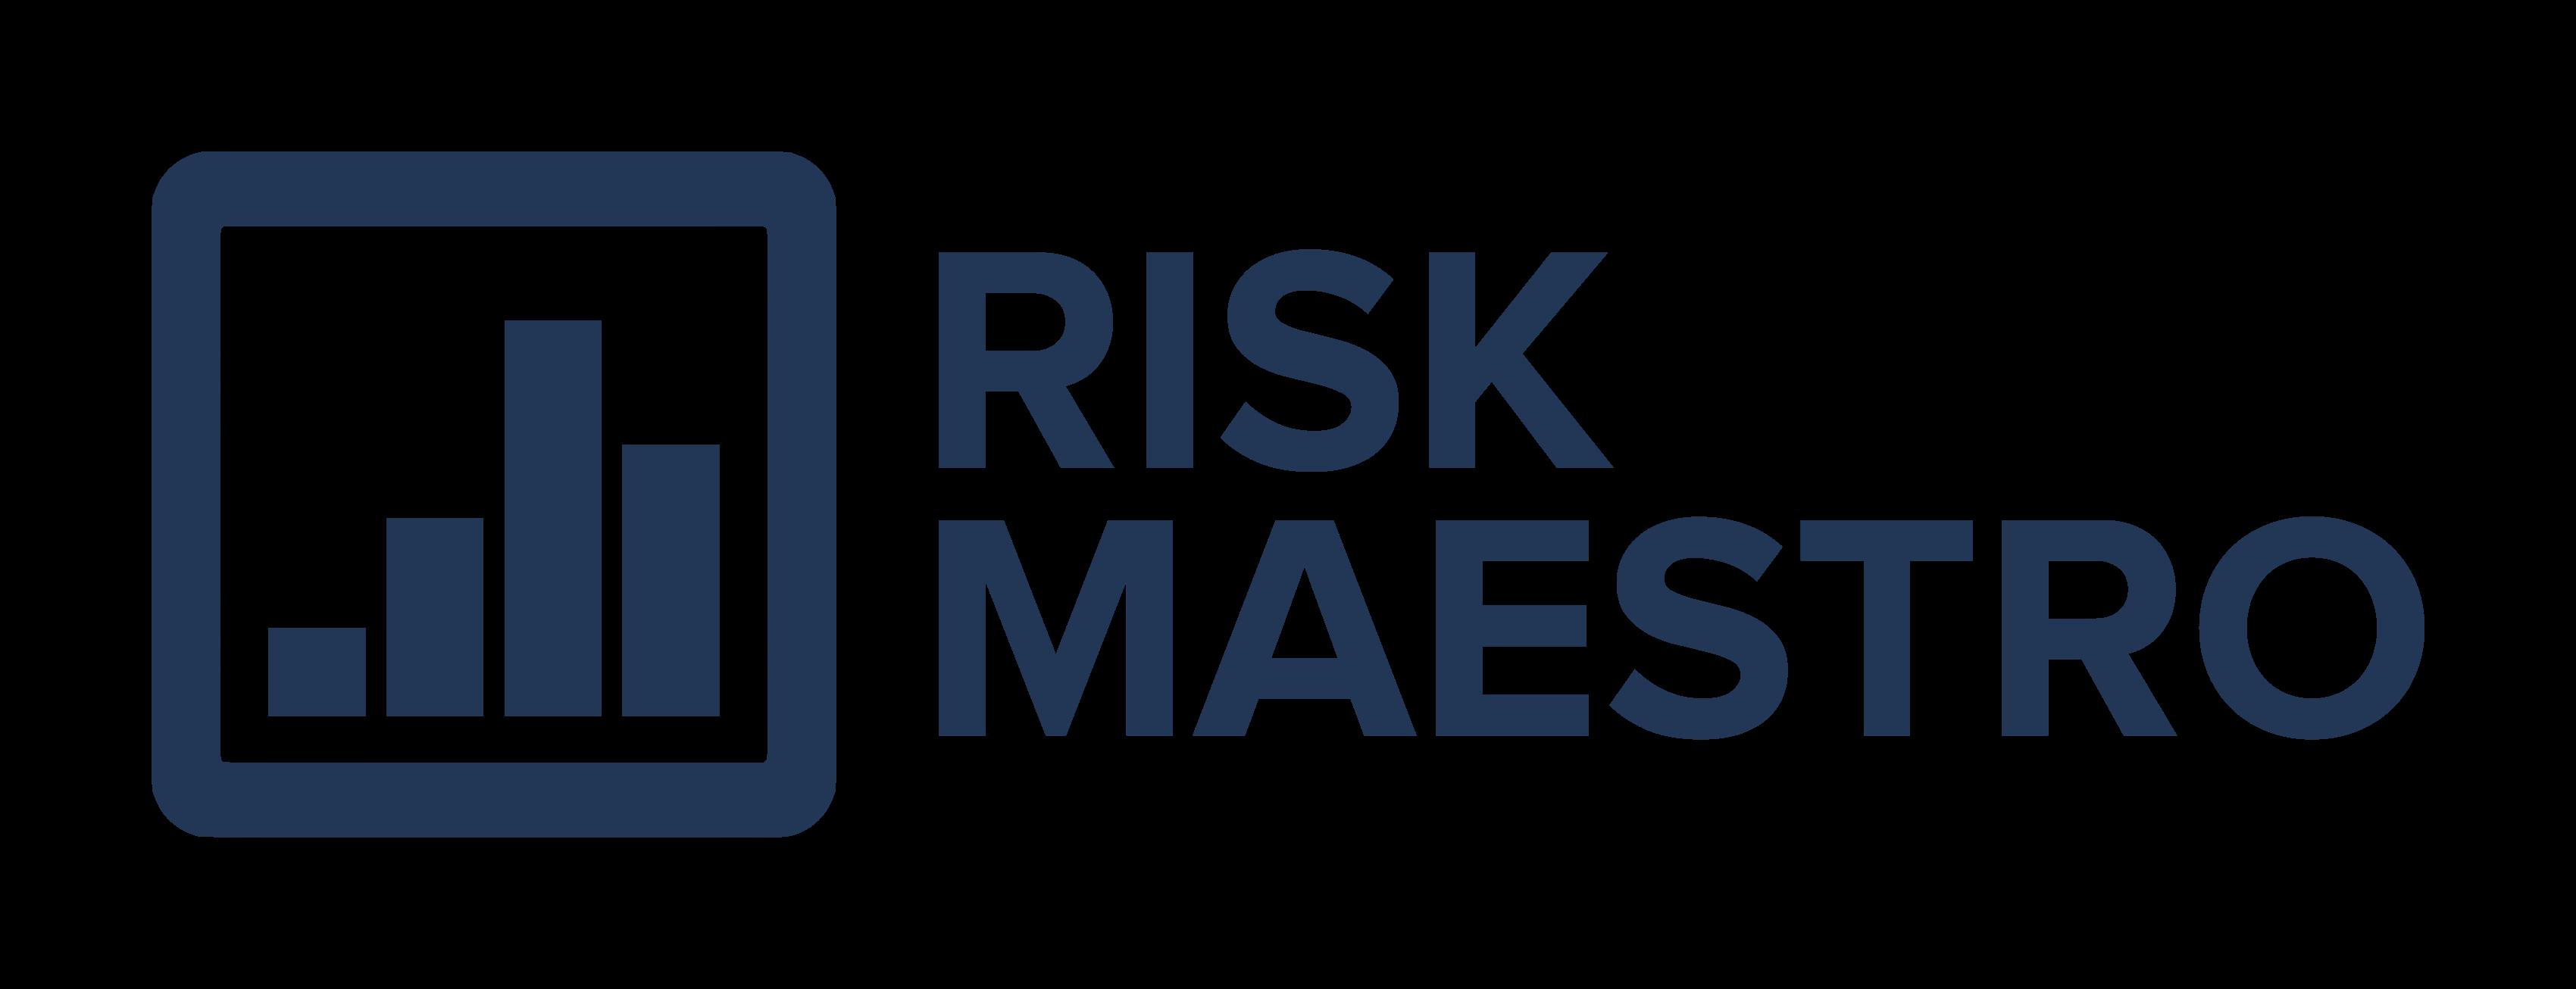 Risk Maestro